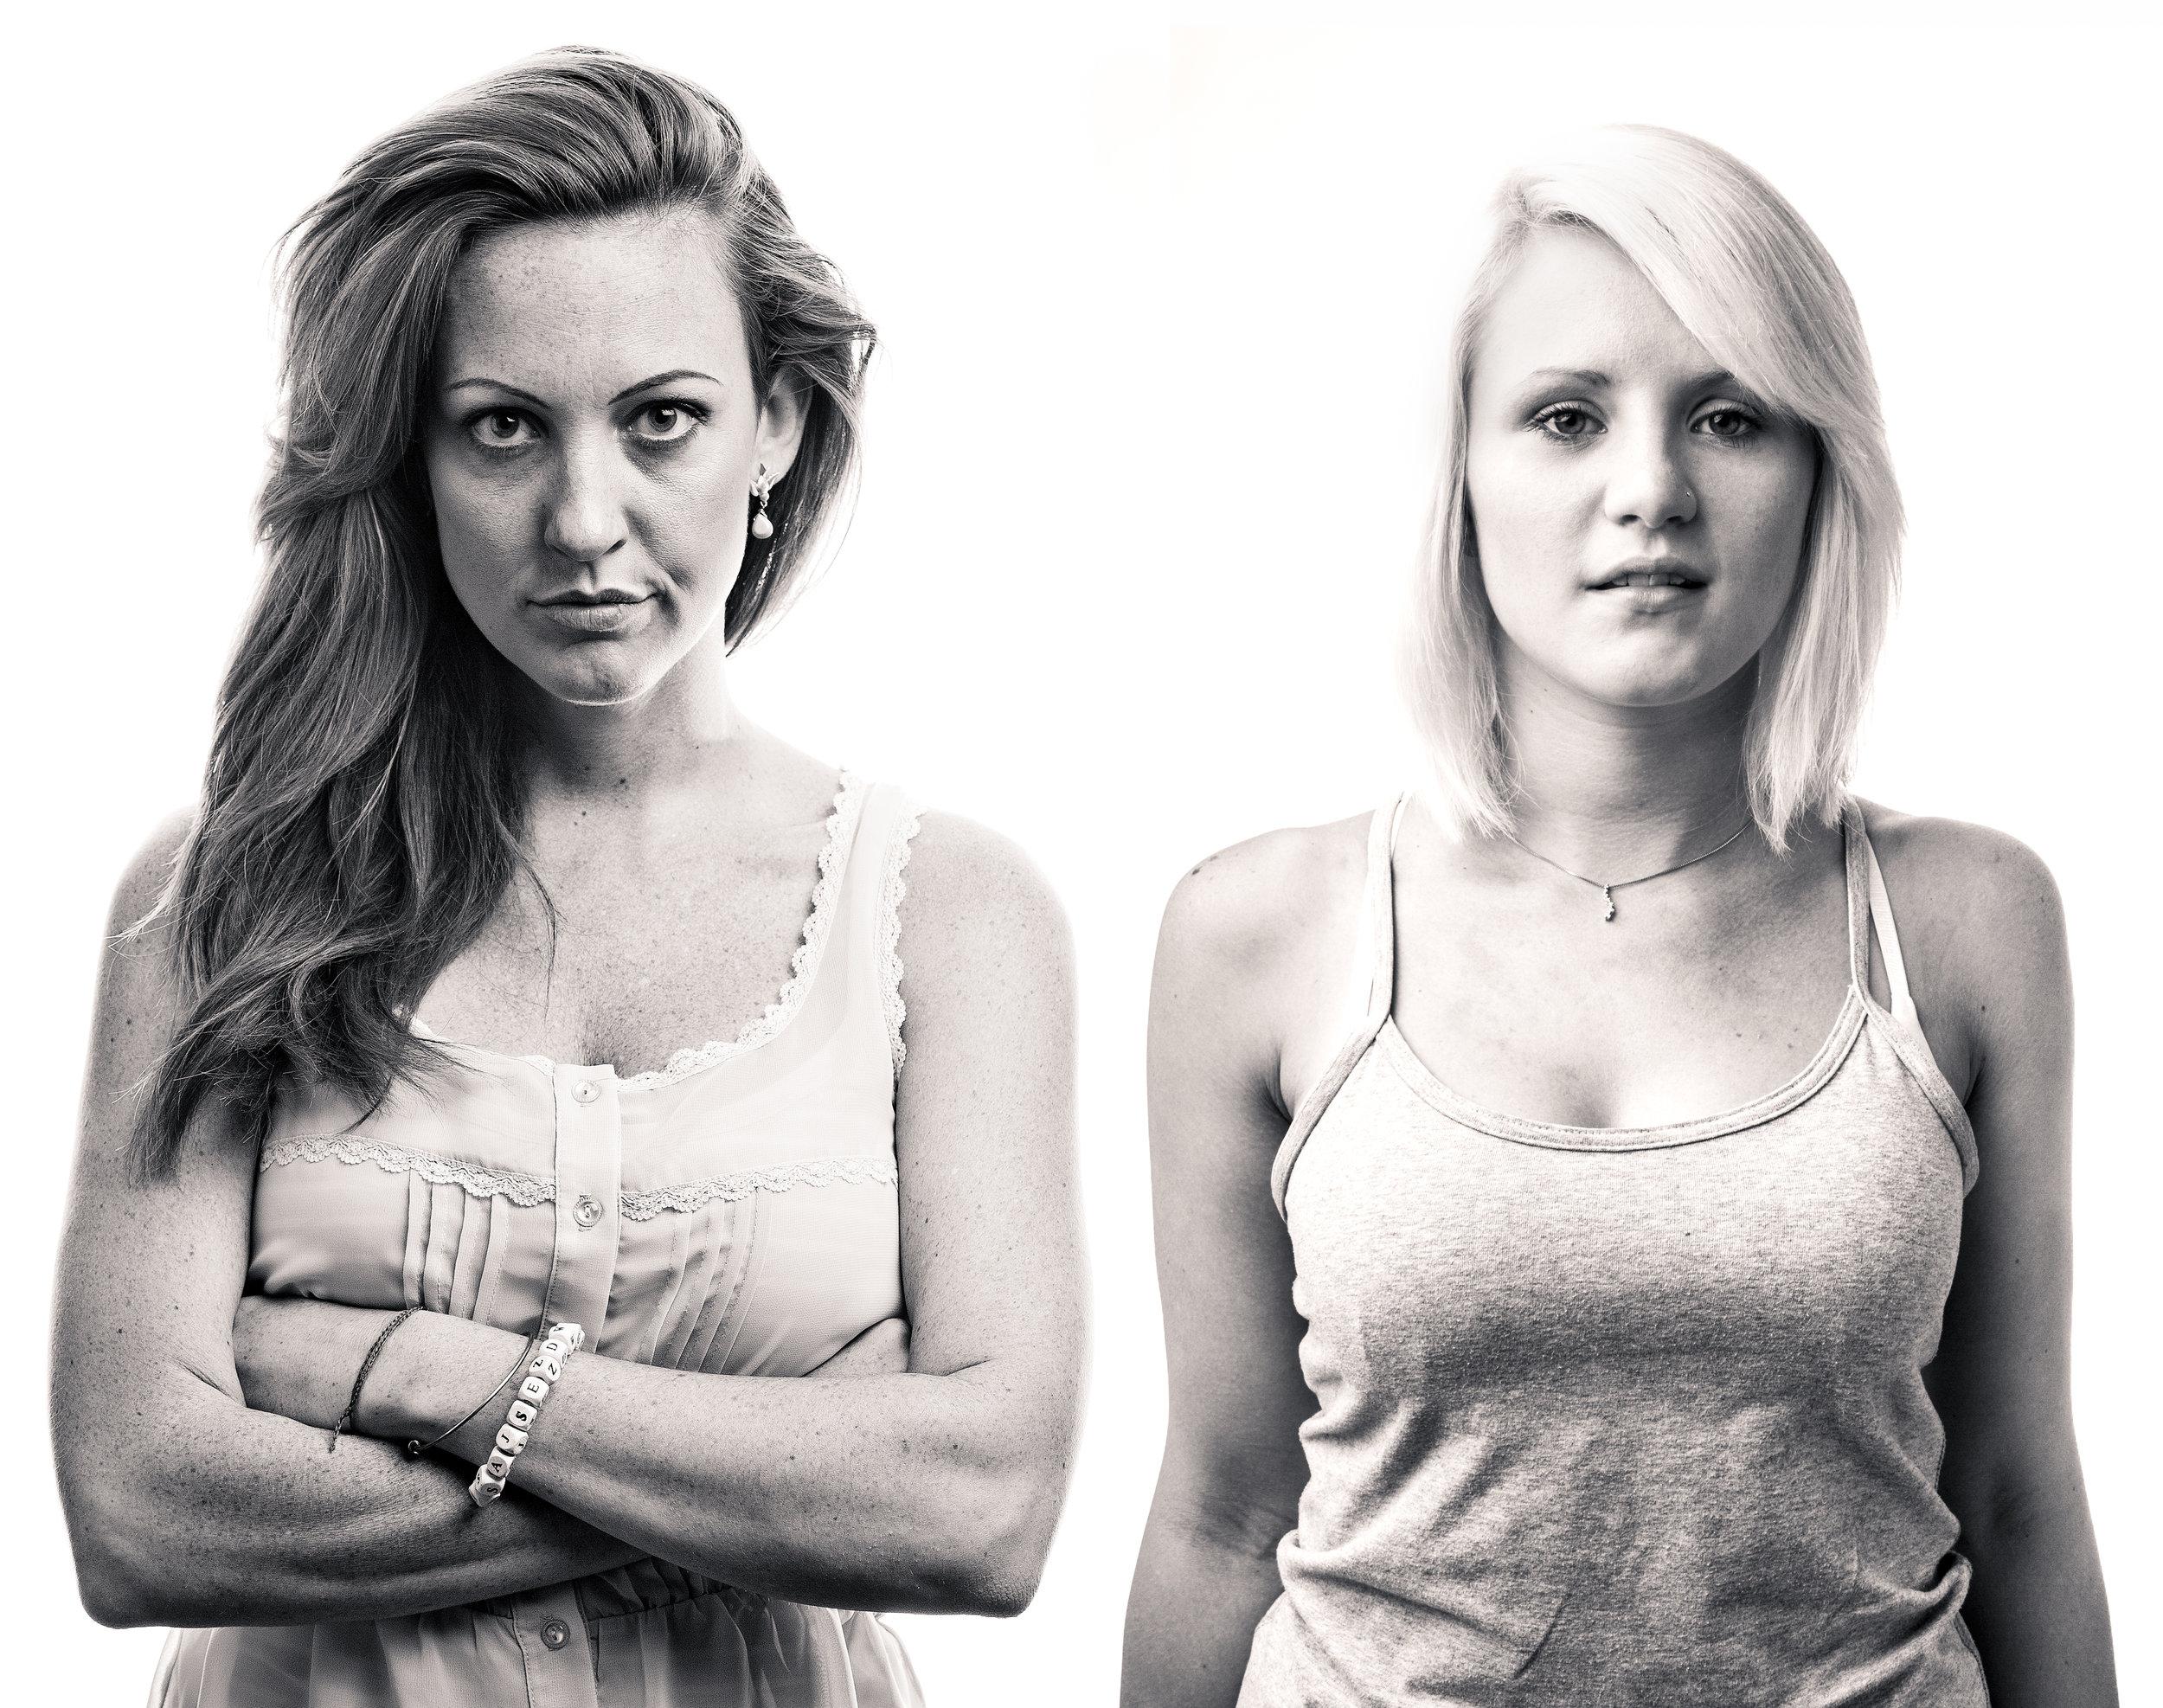 deyoephoto-black-white-2.jpg